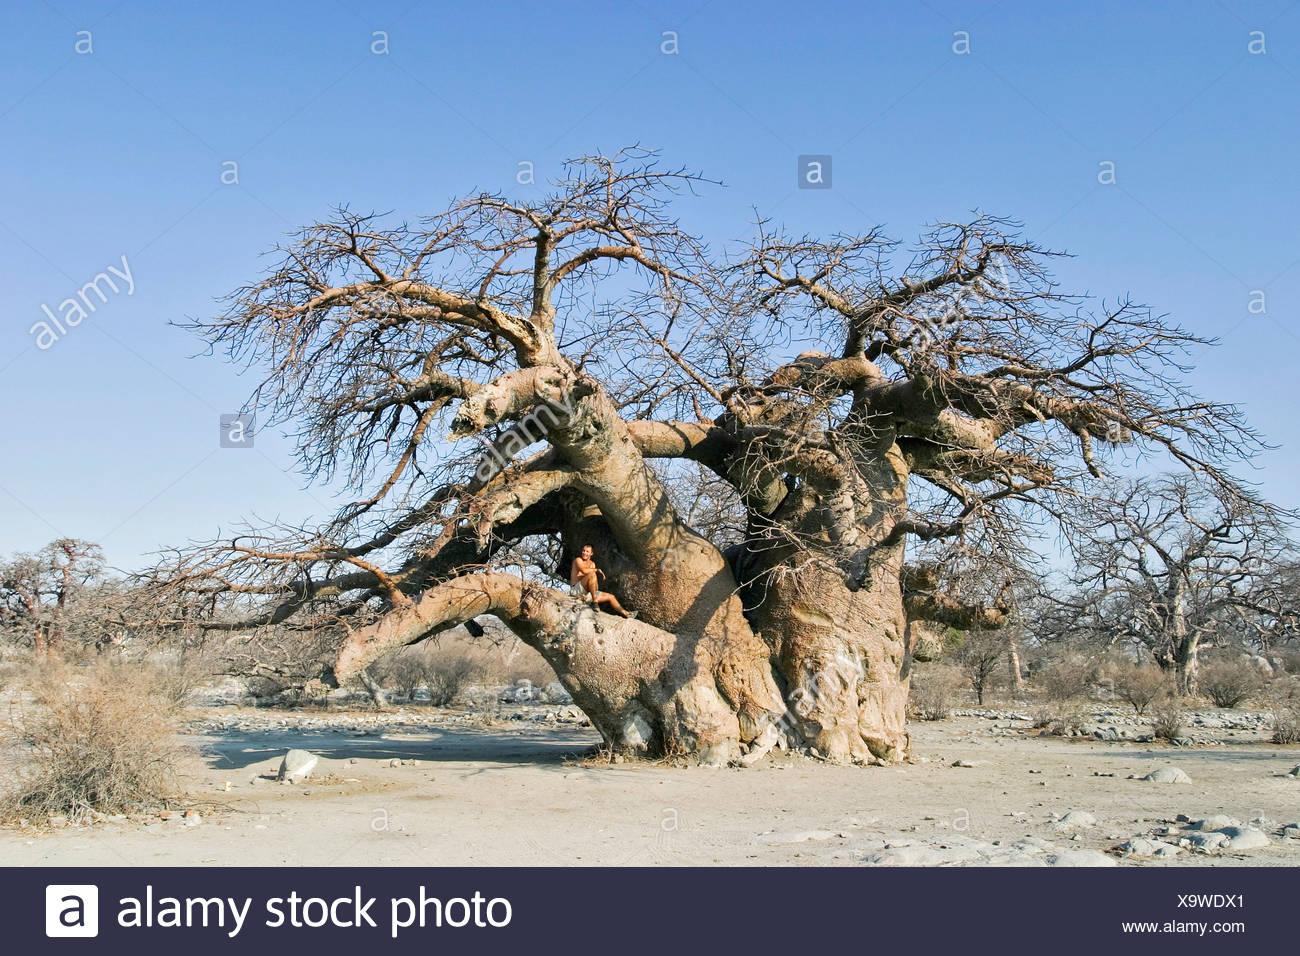 Baobabs or Adansonia digitata on Kubu Island (Lekubu) in the south west of Sowa Pan, Makgadikgadi pans, Botswana, Africa Stock Photo